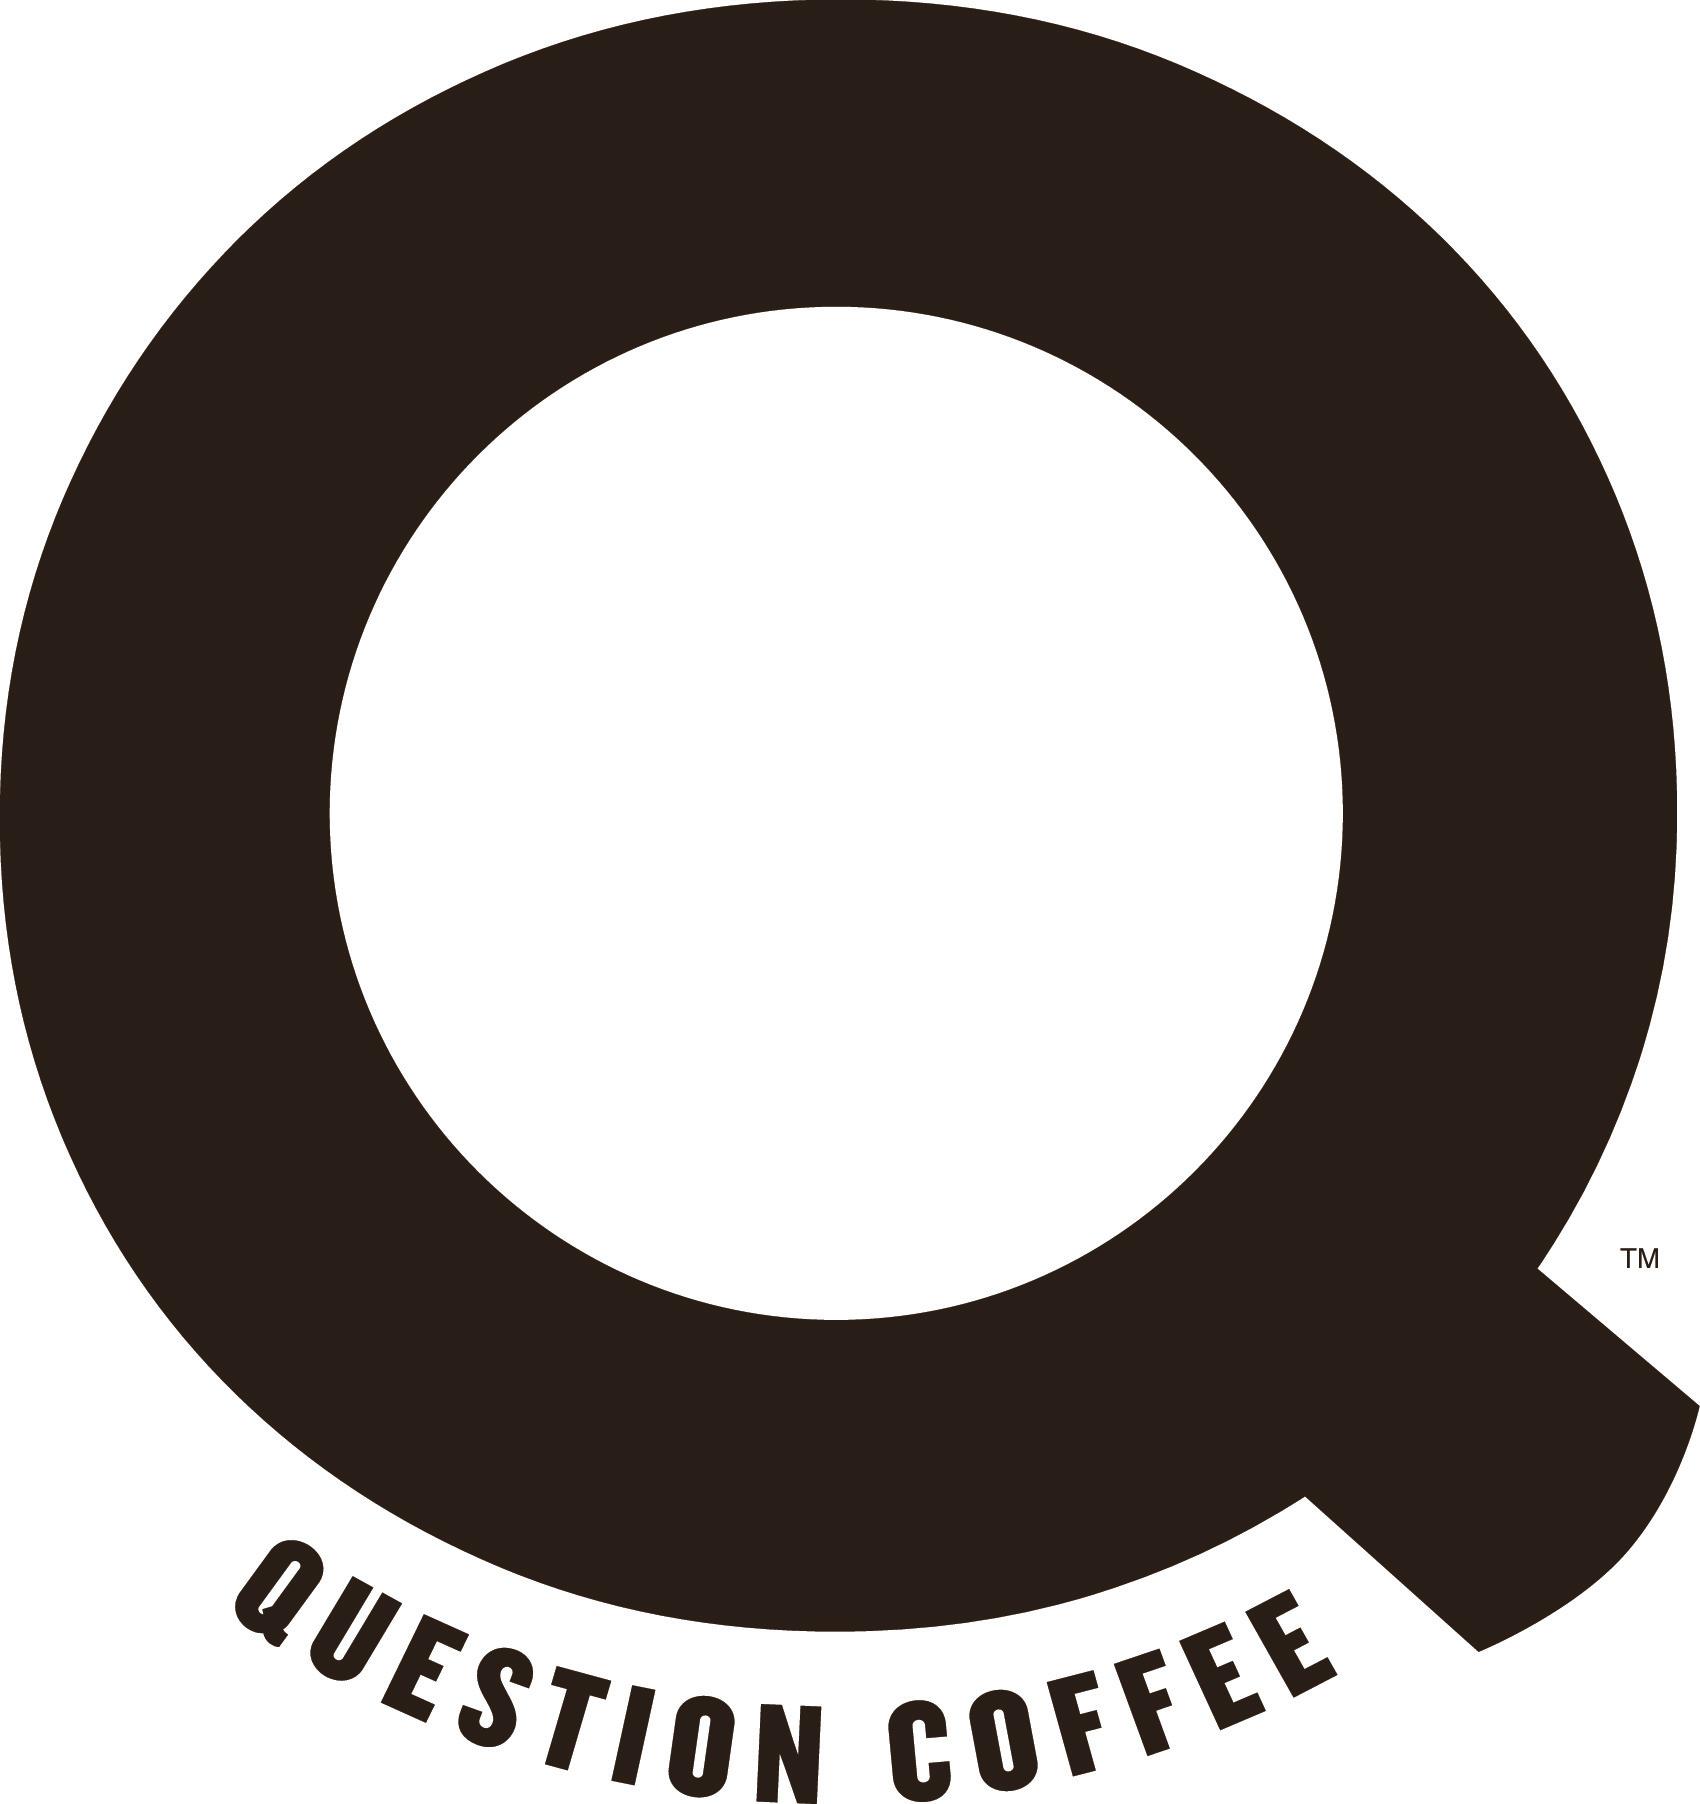 Question Coffee logo brown.jpg